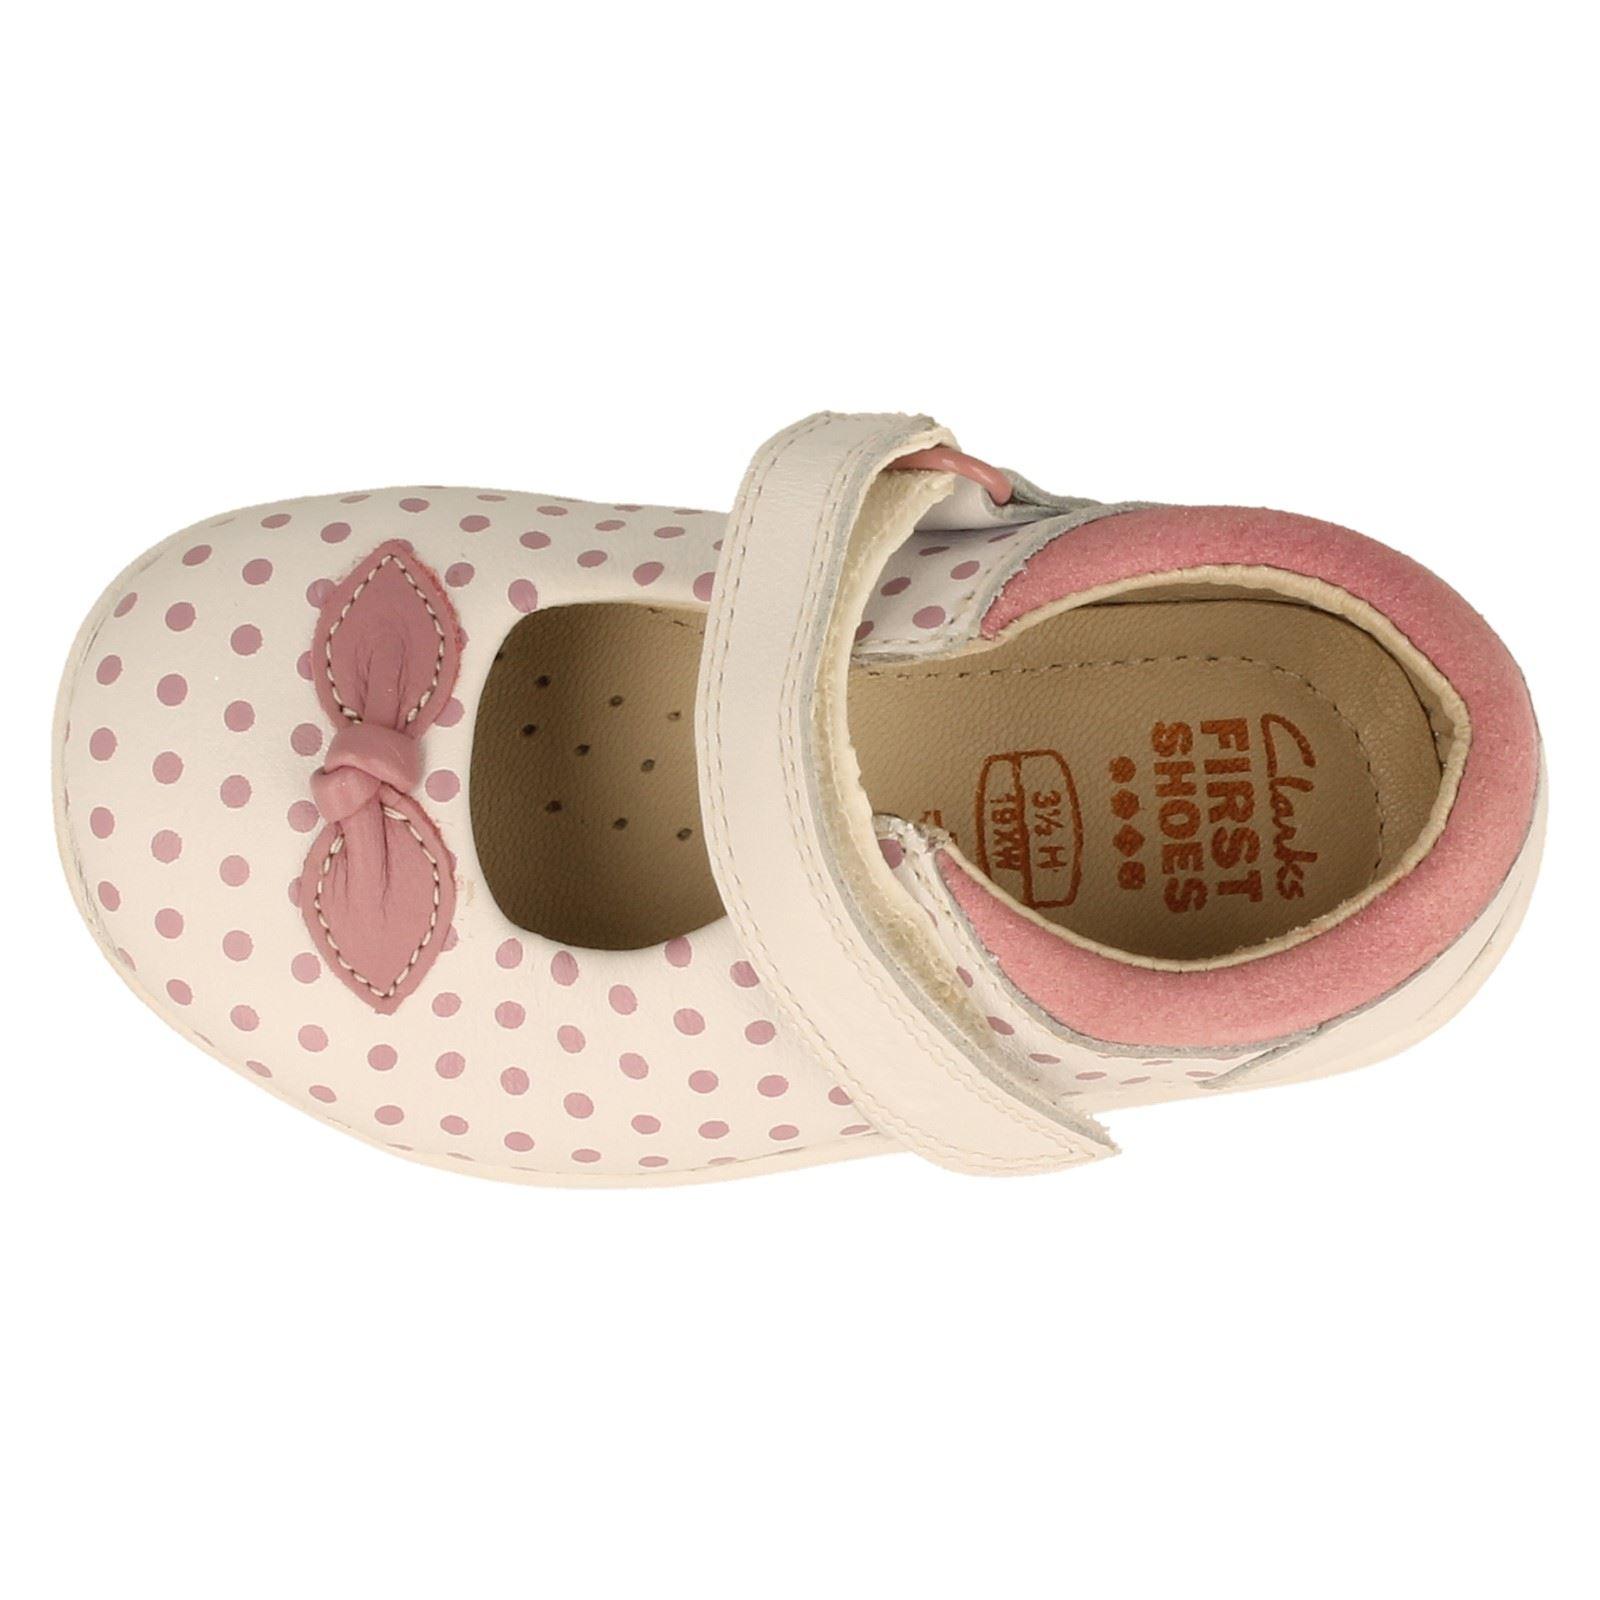 Chicas Clarks Primero Zapatos Estilo Mary Jane suavemente Dotty-W